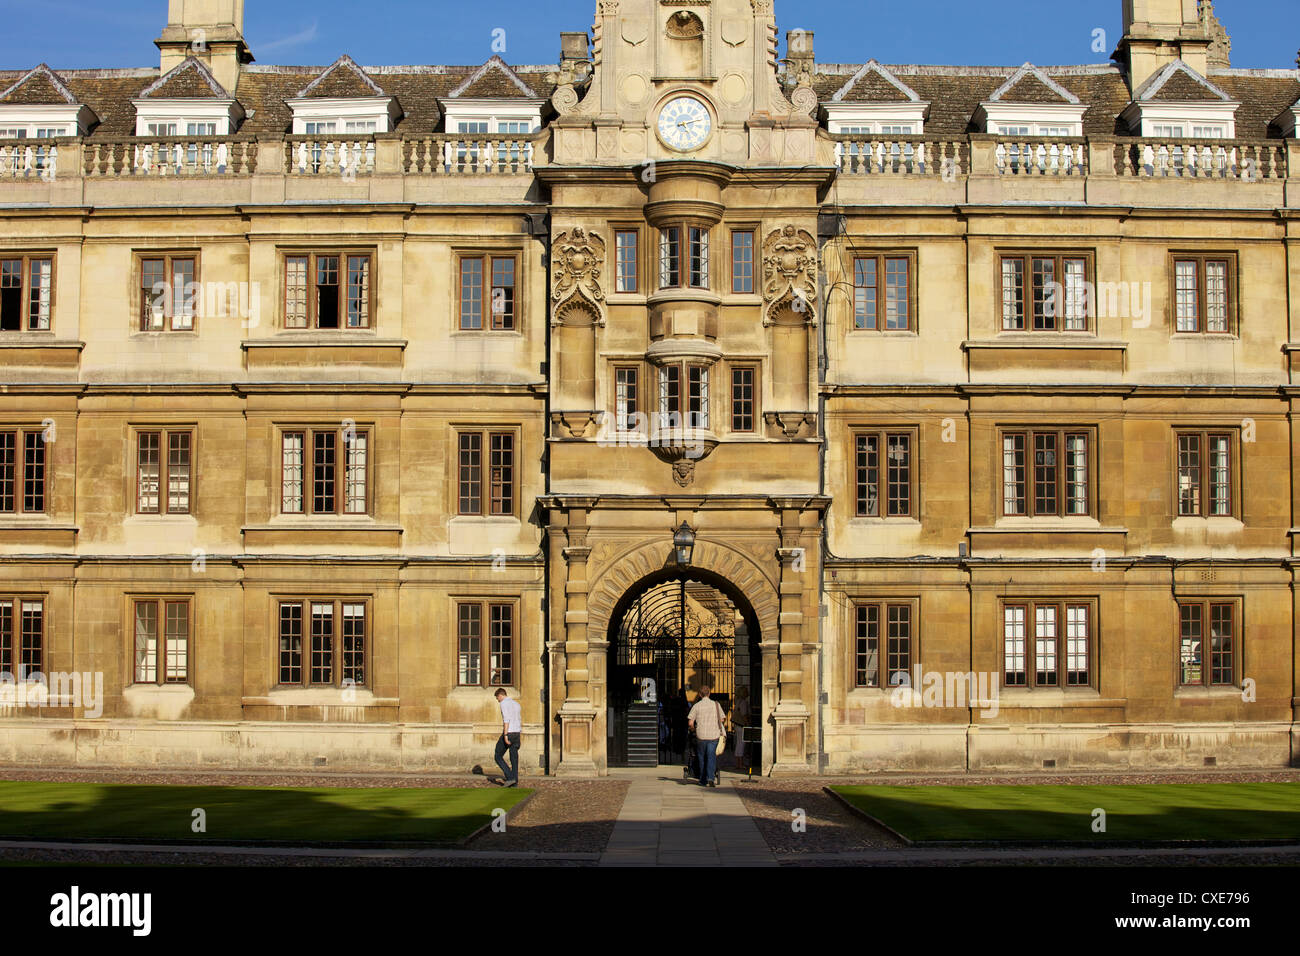 Clare College, Cambridge, England - Stock Image